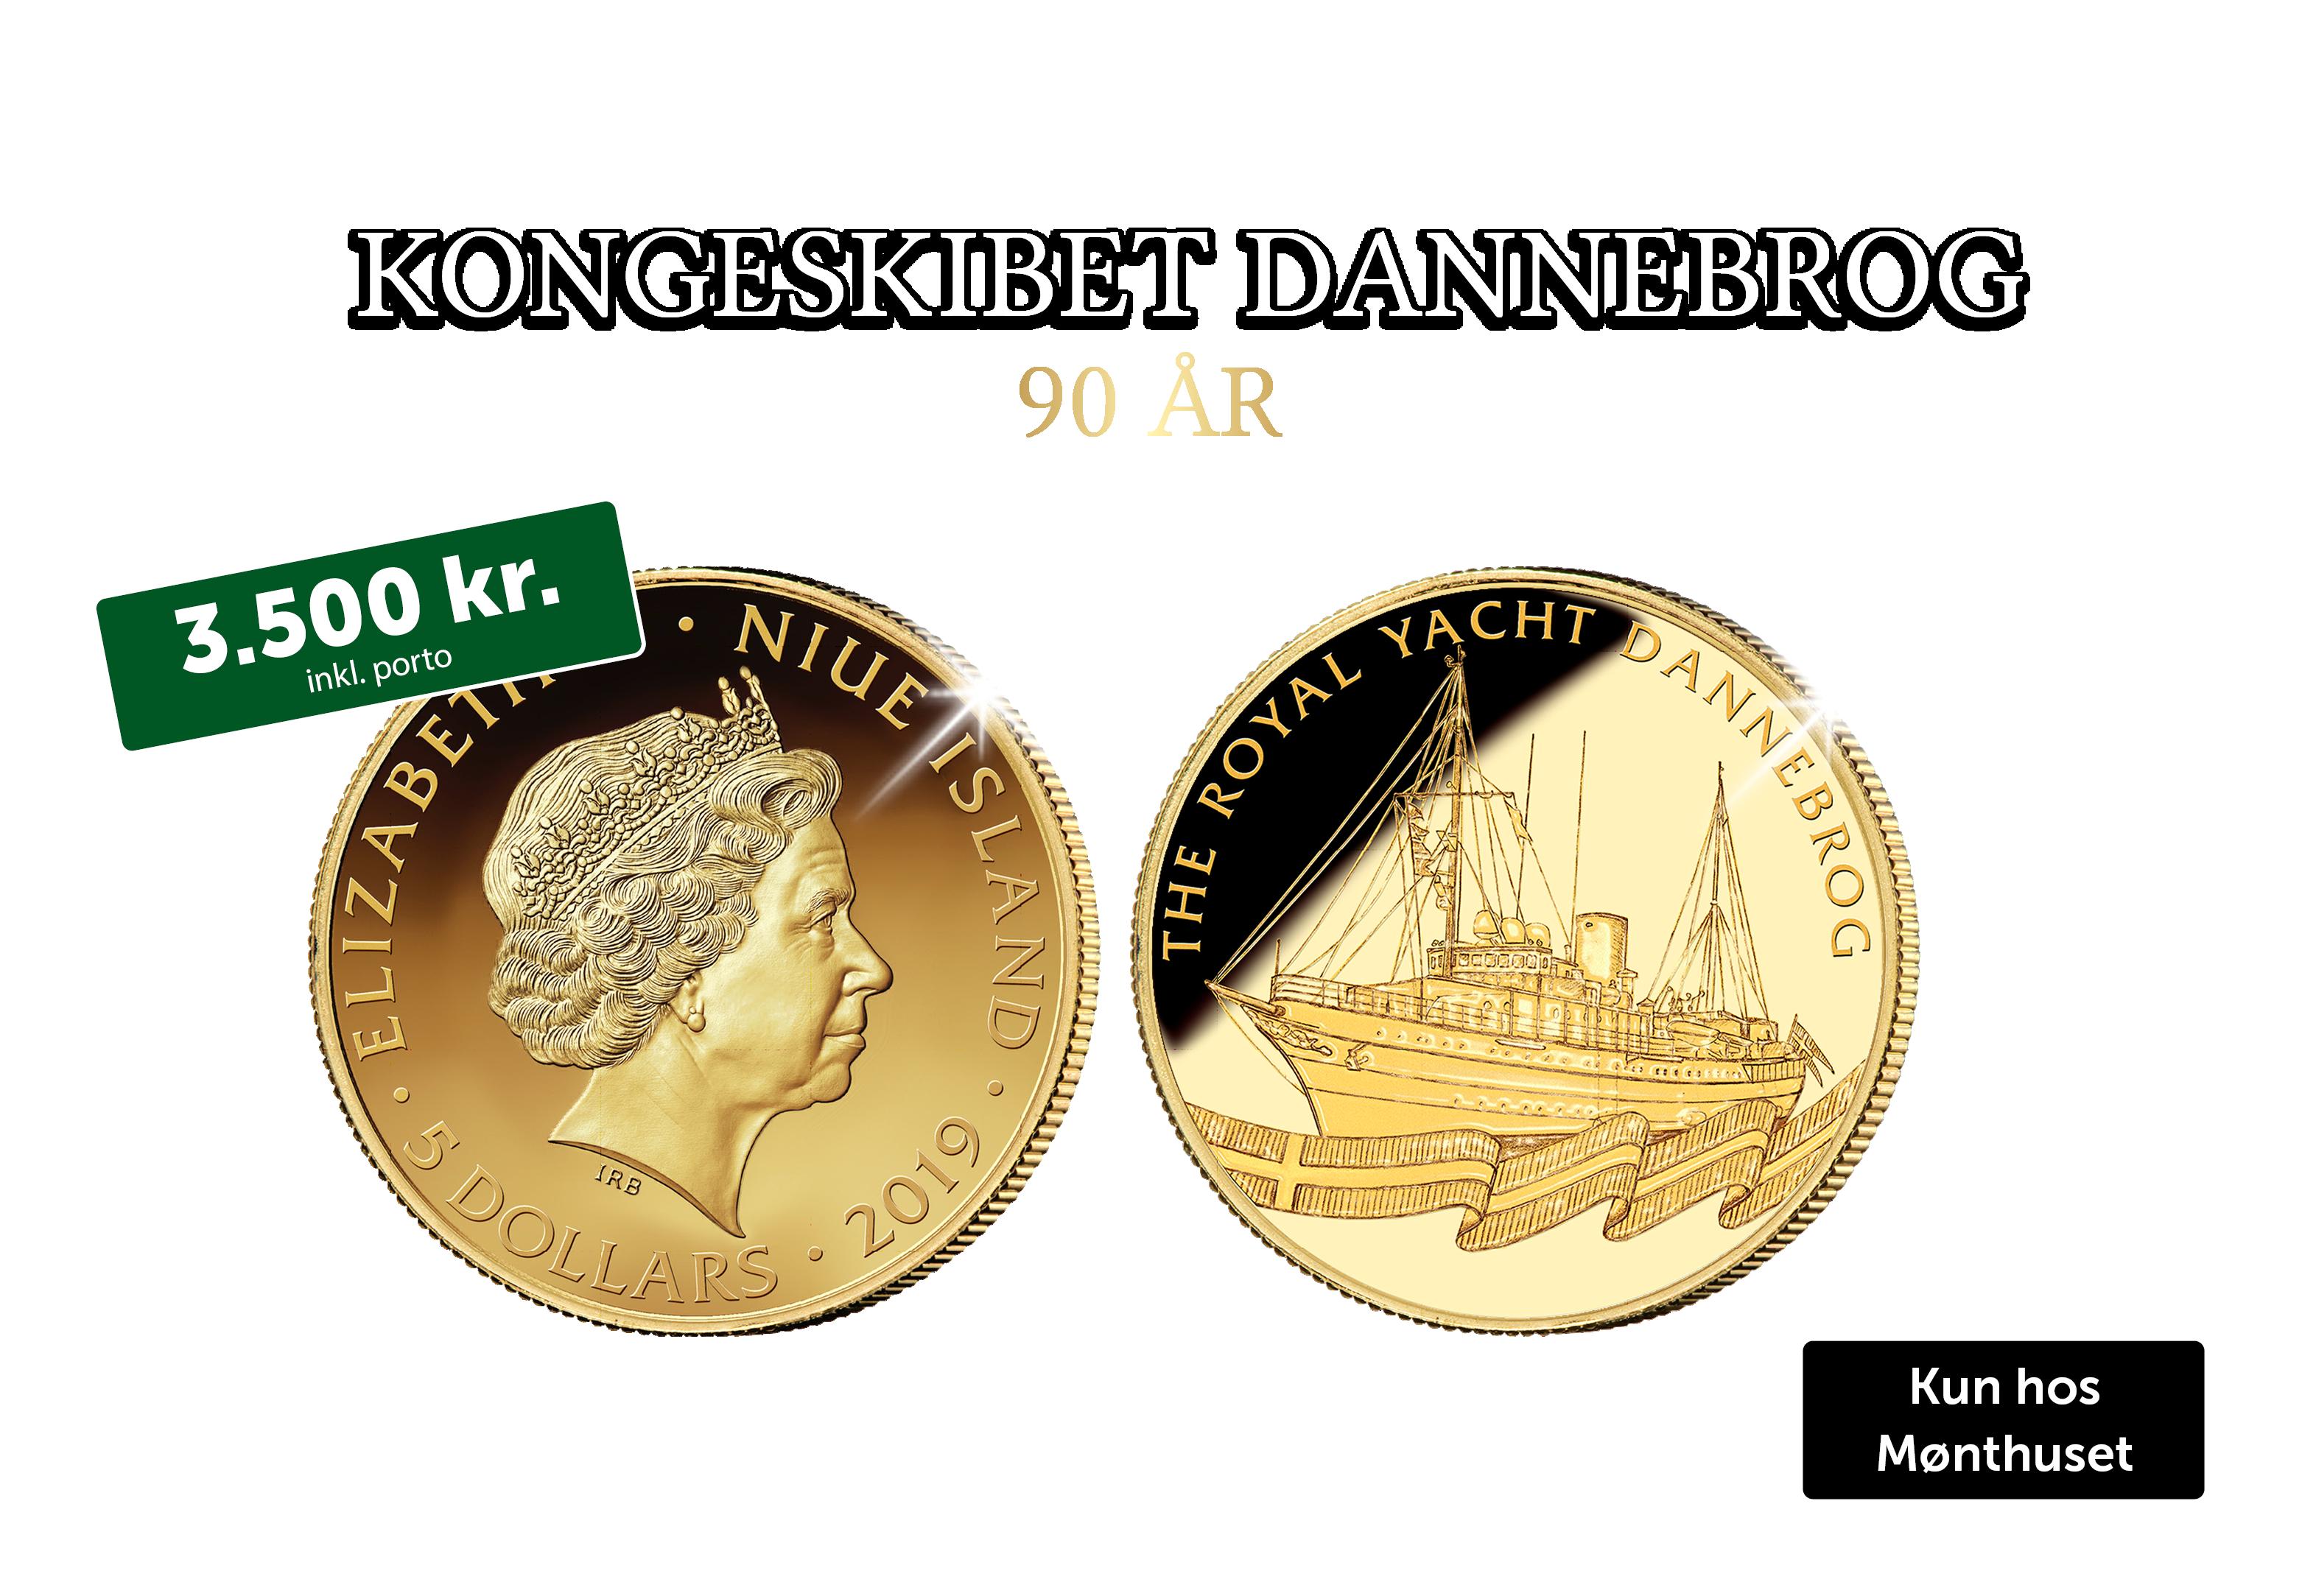 Dannebrog 800 år - Guldmønt med Kongeskibet Dannebrog